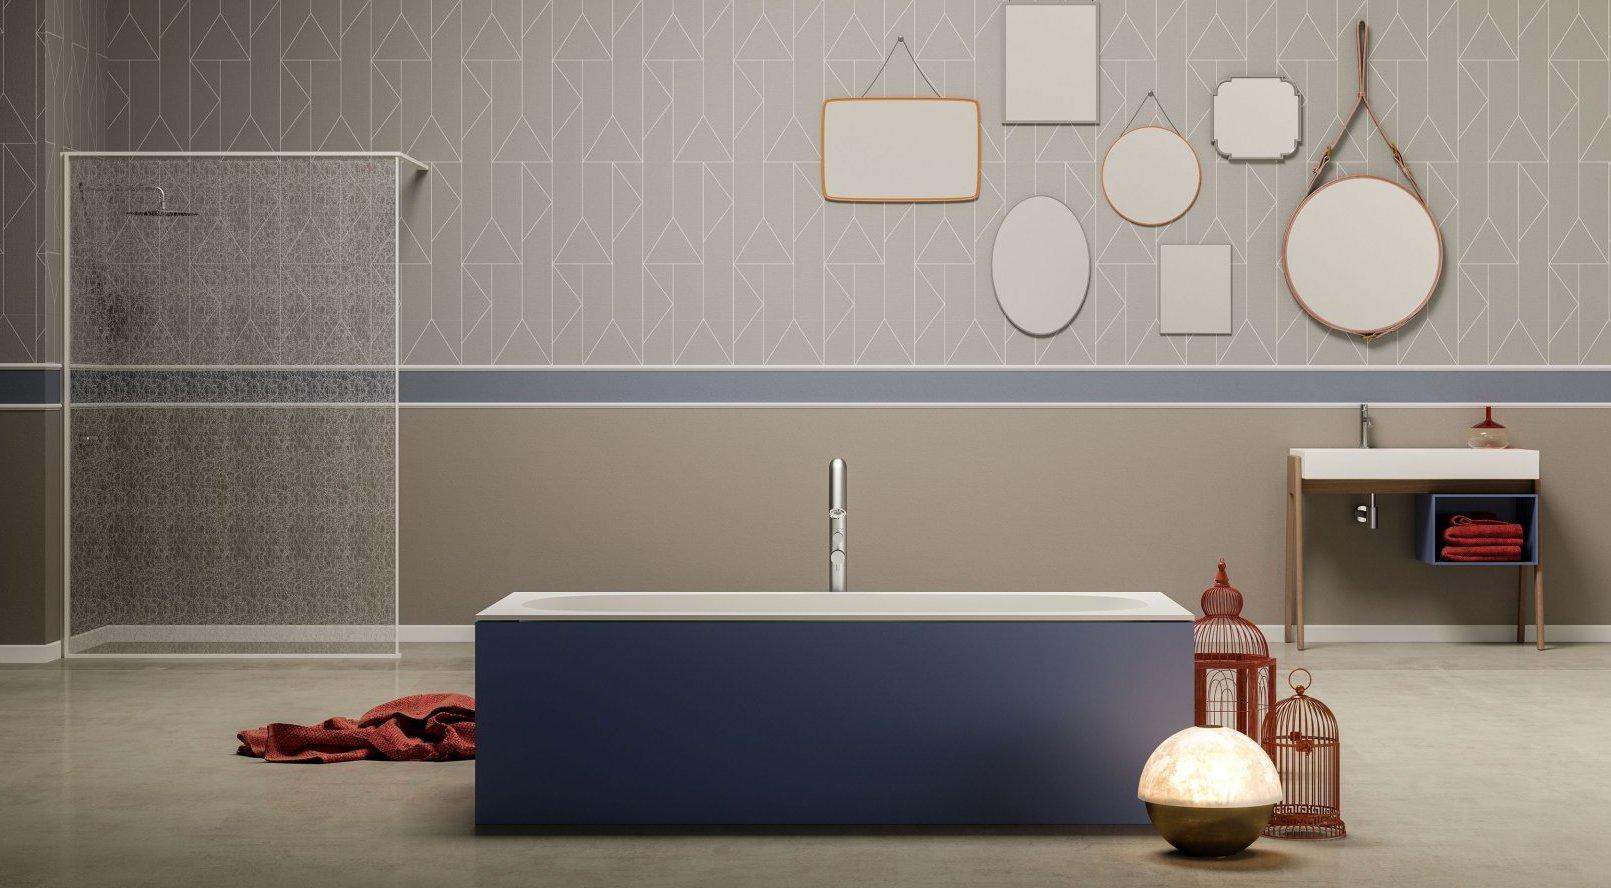 Vasche Da Bagno Blu Bleu Prezzi : Blubleu vasche freestanding